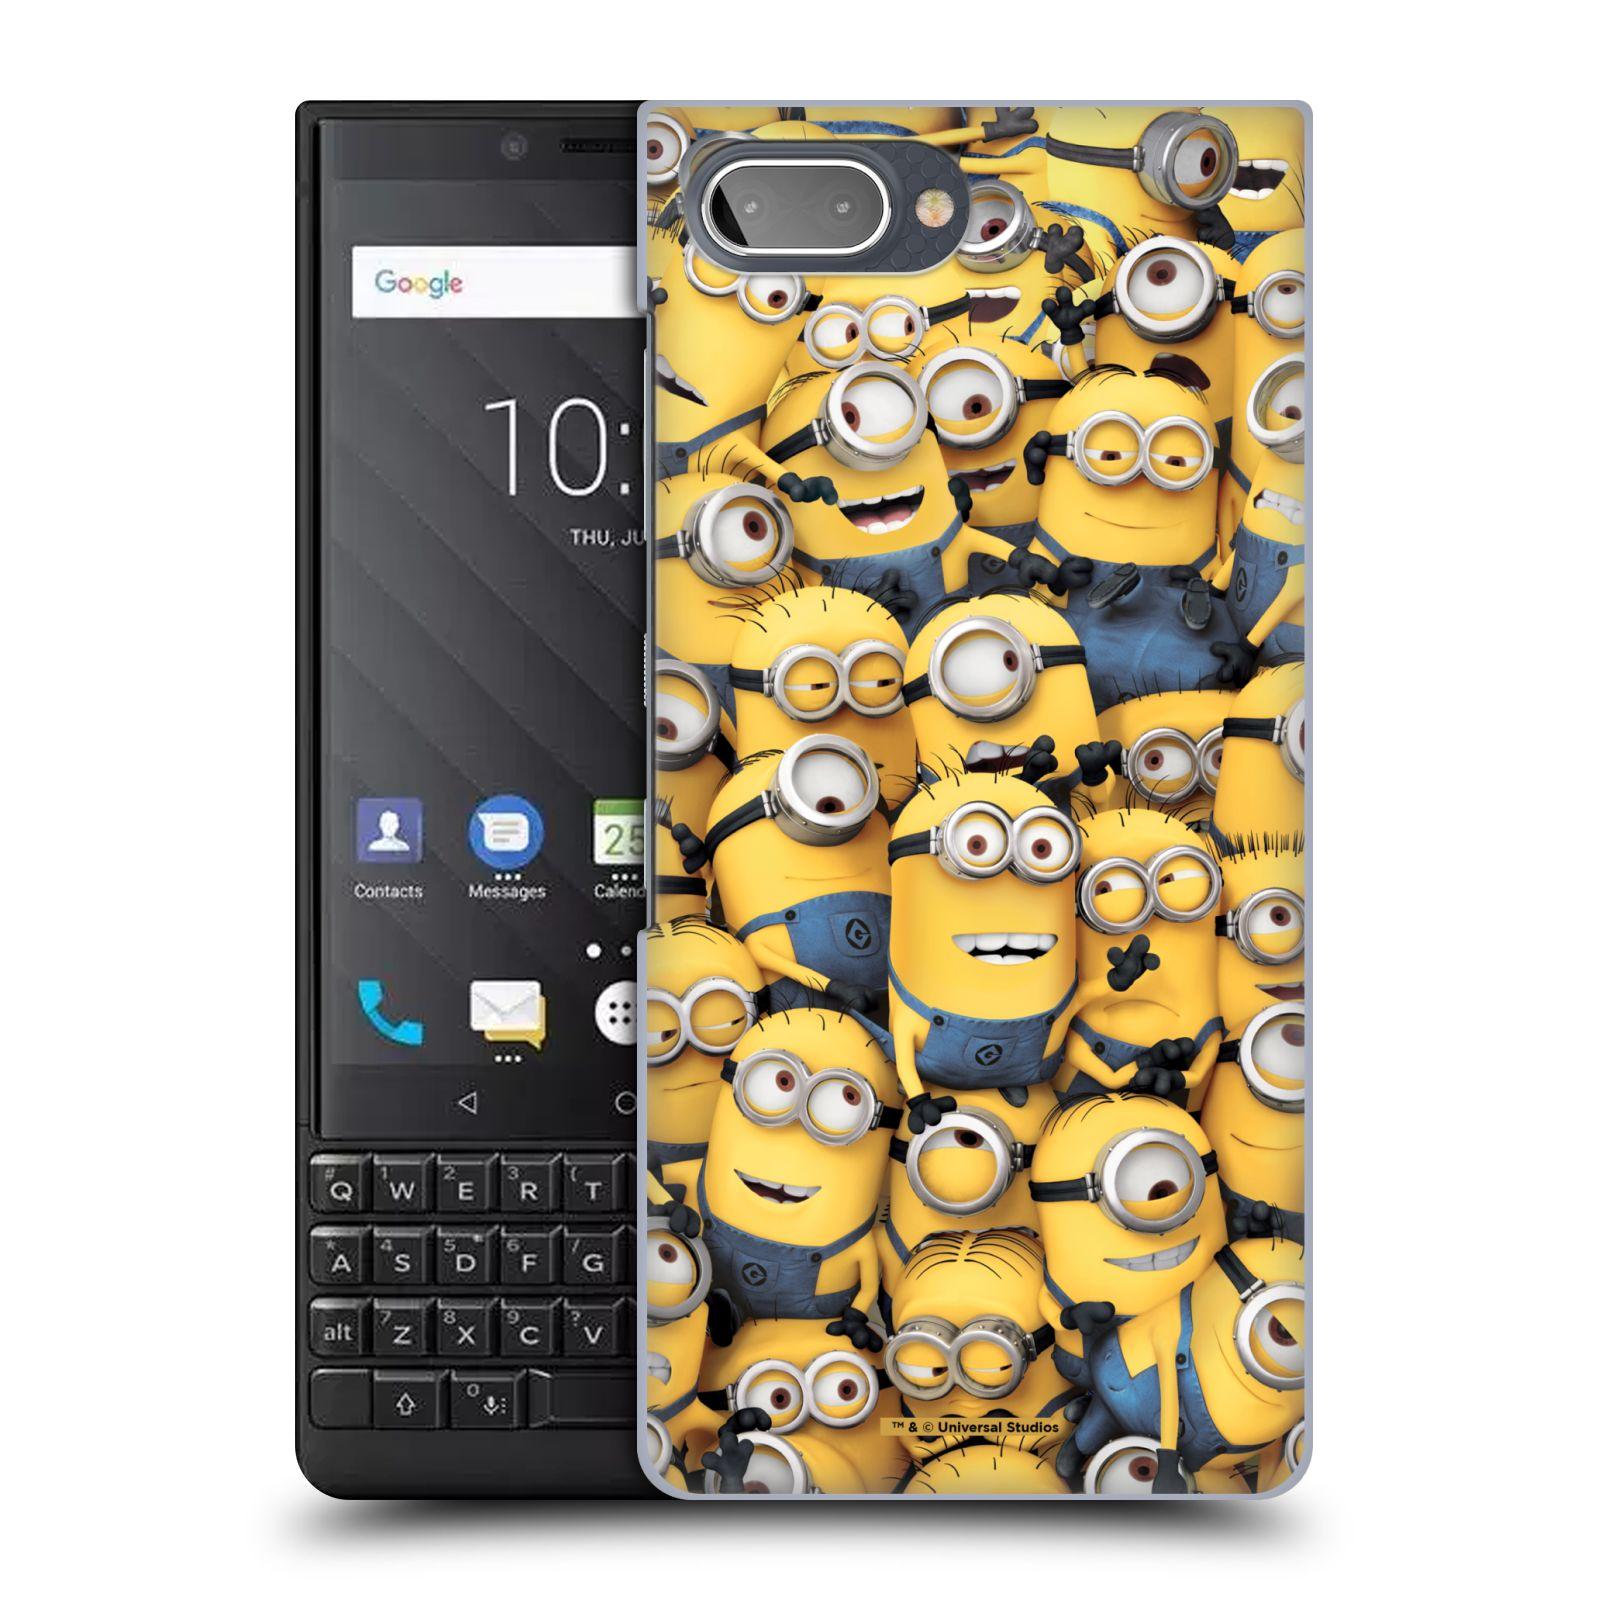 Plastové pouzdro na mobil Blackberry Key 2 - Head Case - Mimoni všude z filmu Já, padouch - Despicable Me